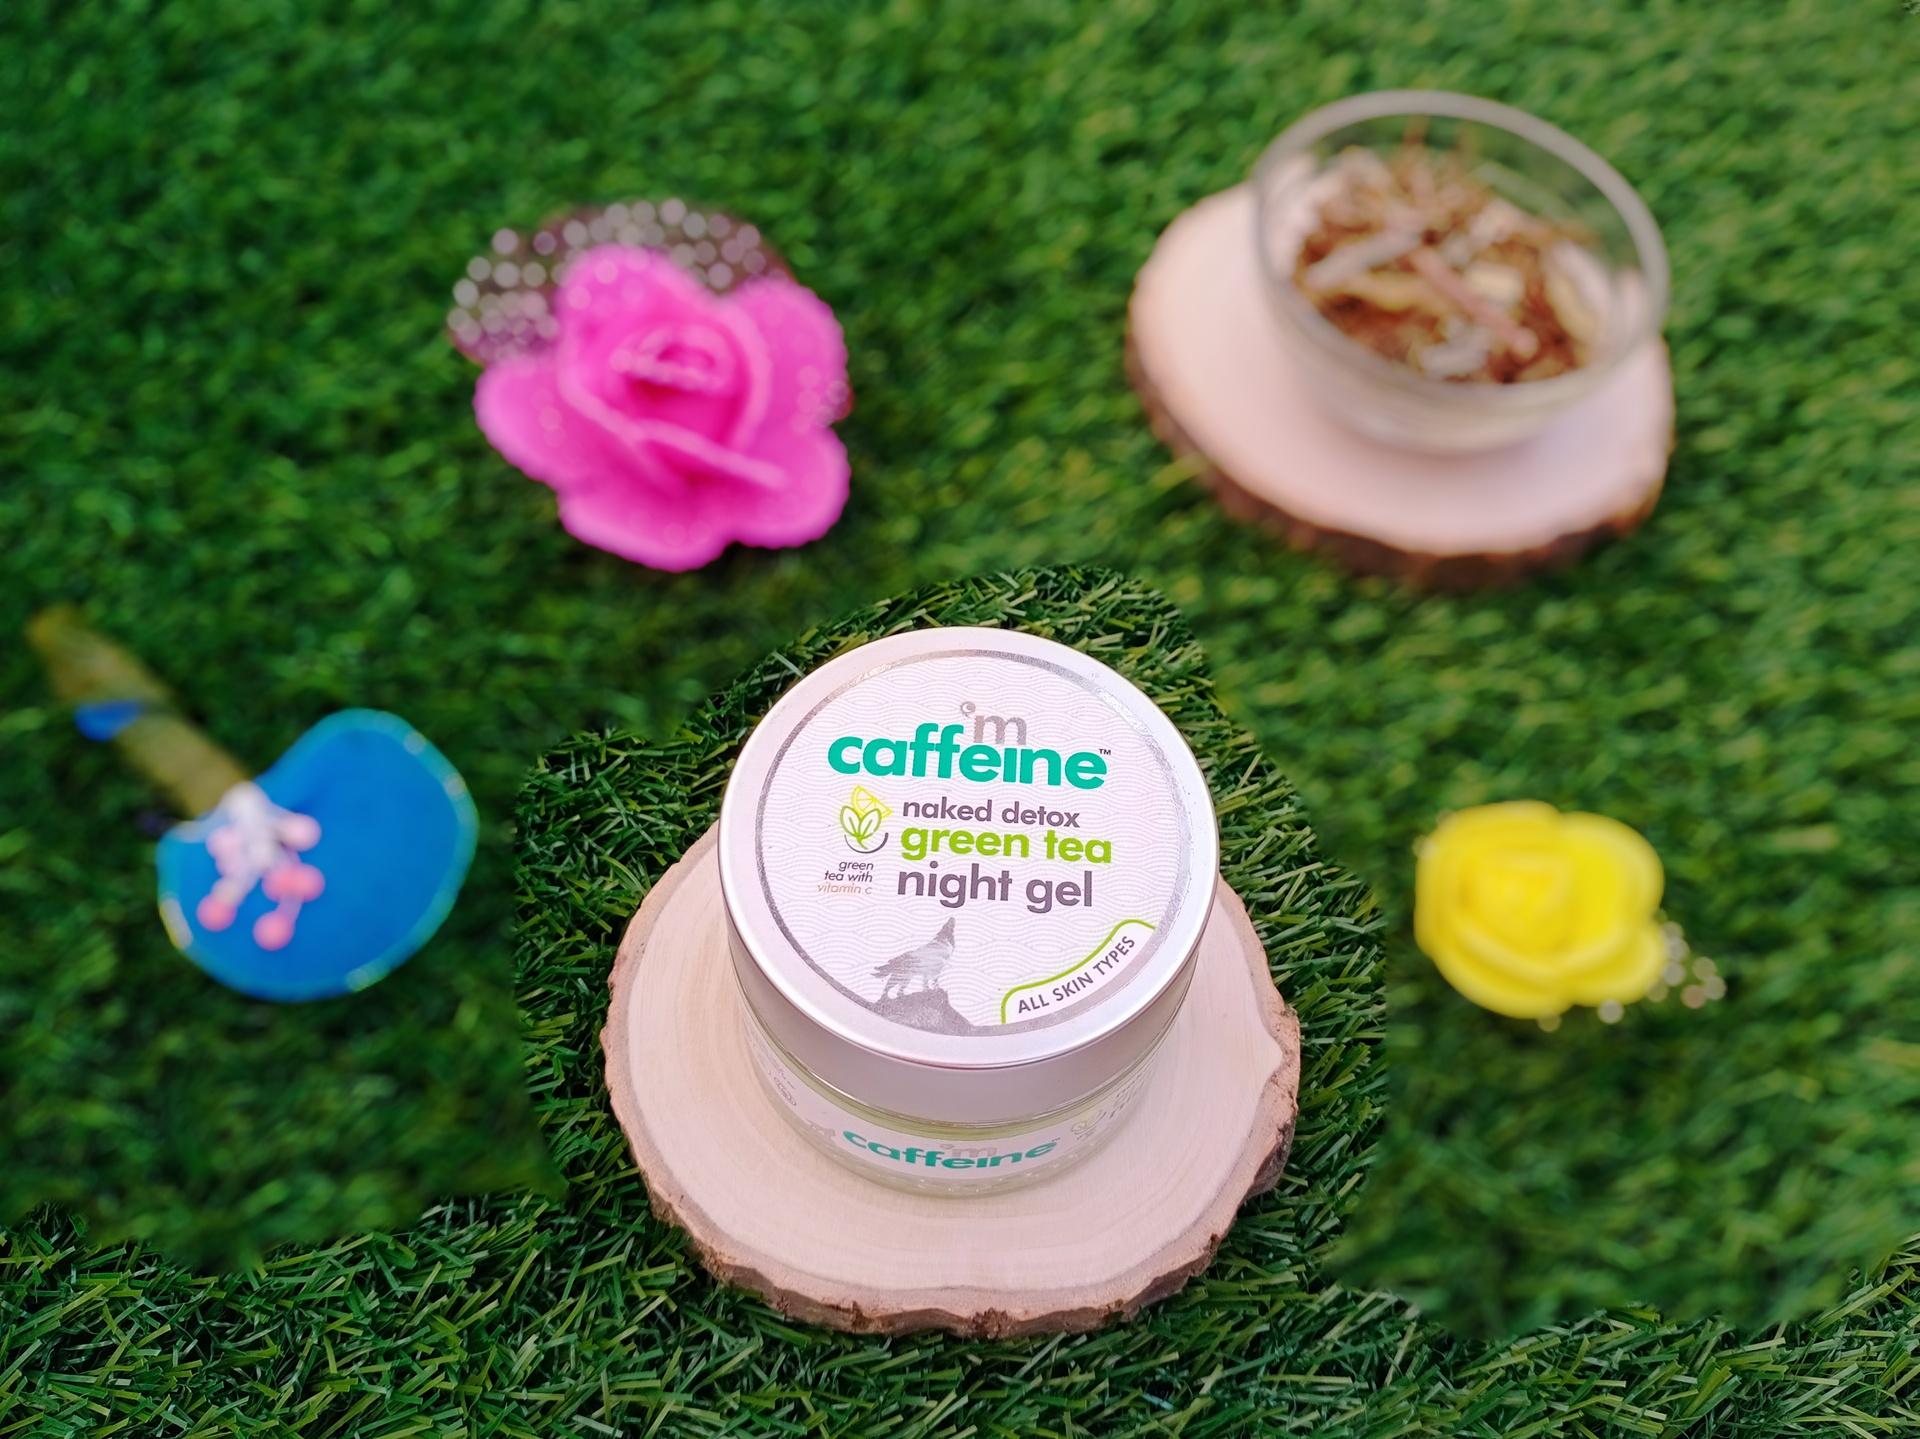 Night gel, green tea, hyaluronic acid, brightening, hydrating